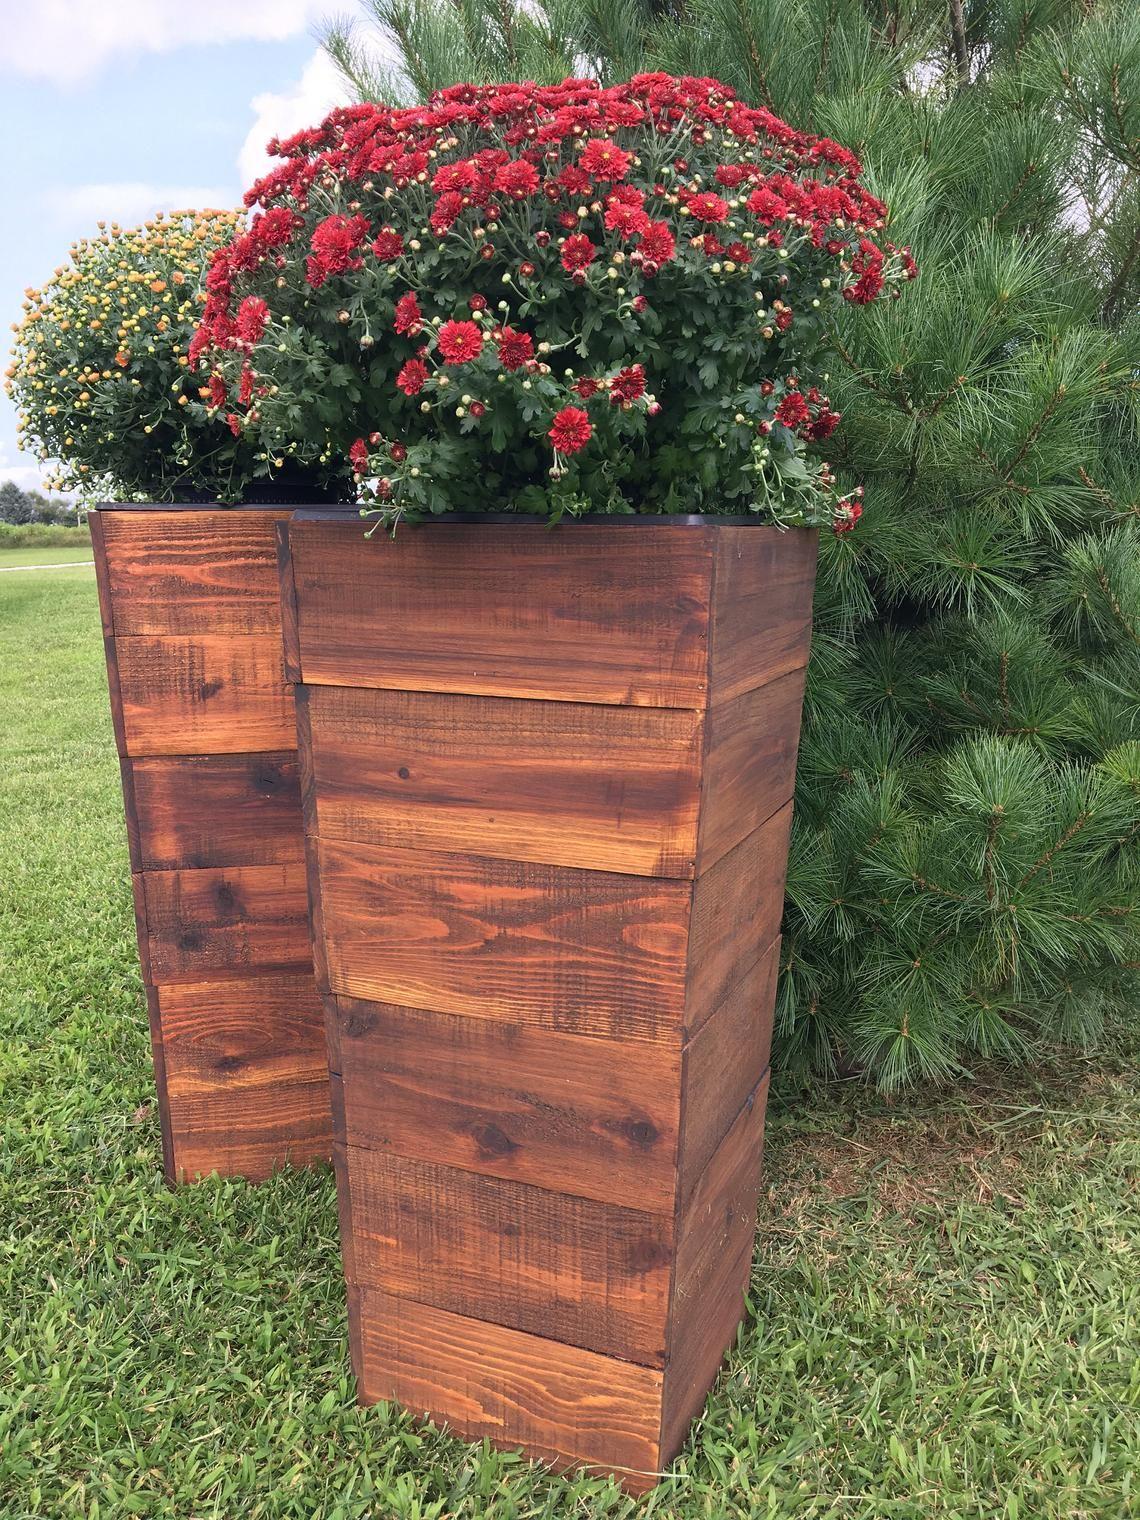 36 Tall Cedar Wood Planter Mocha Patio Planter Etsy Large Outdoor Planters Rustic Planters Patio Planters